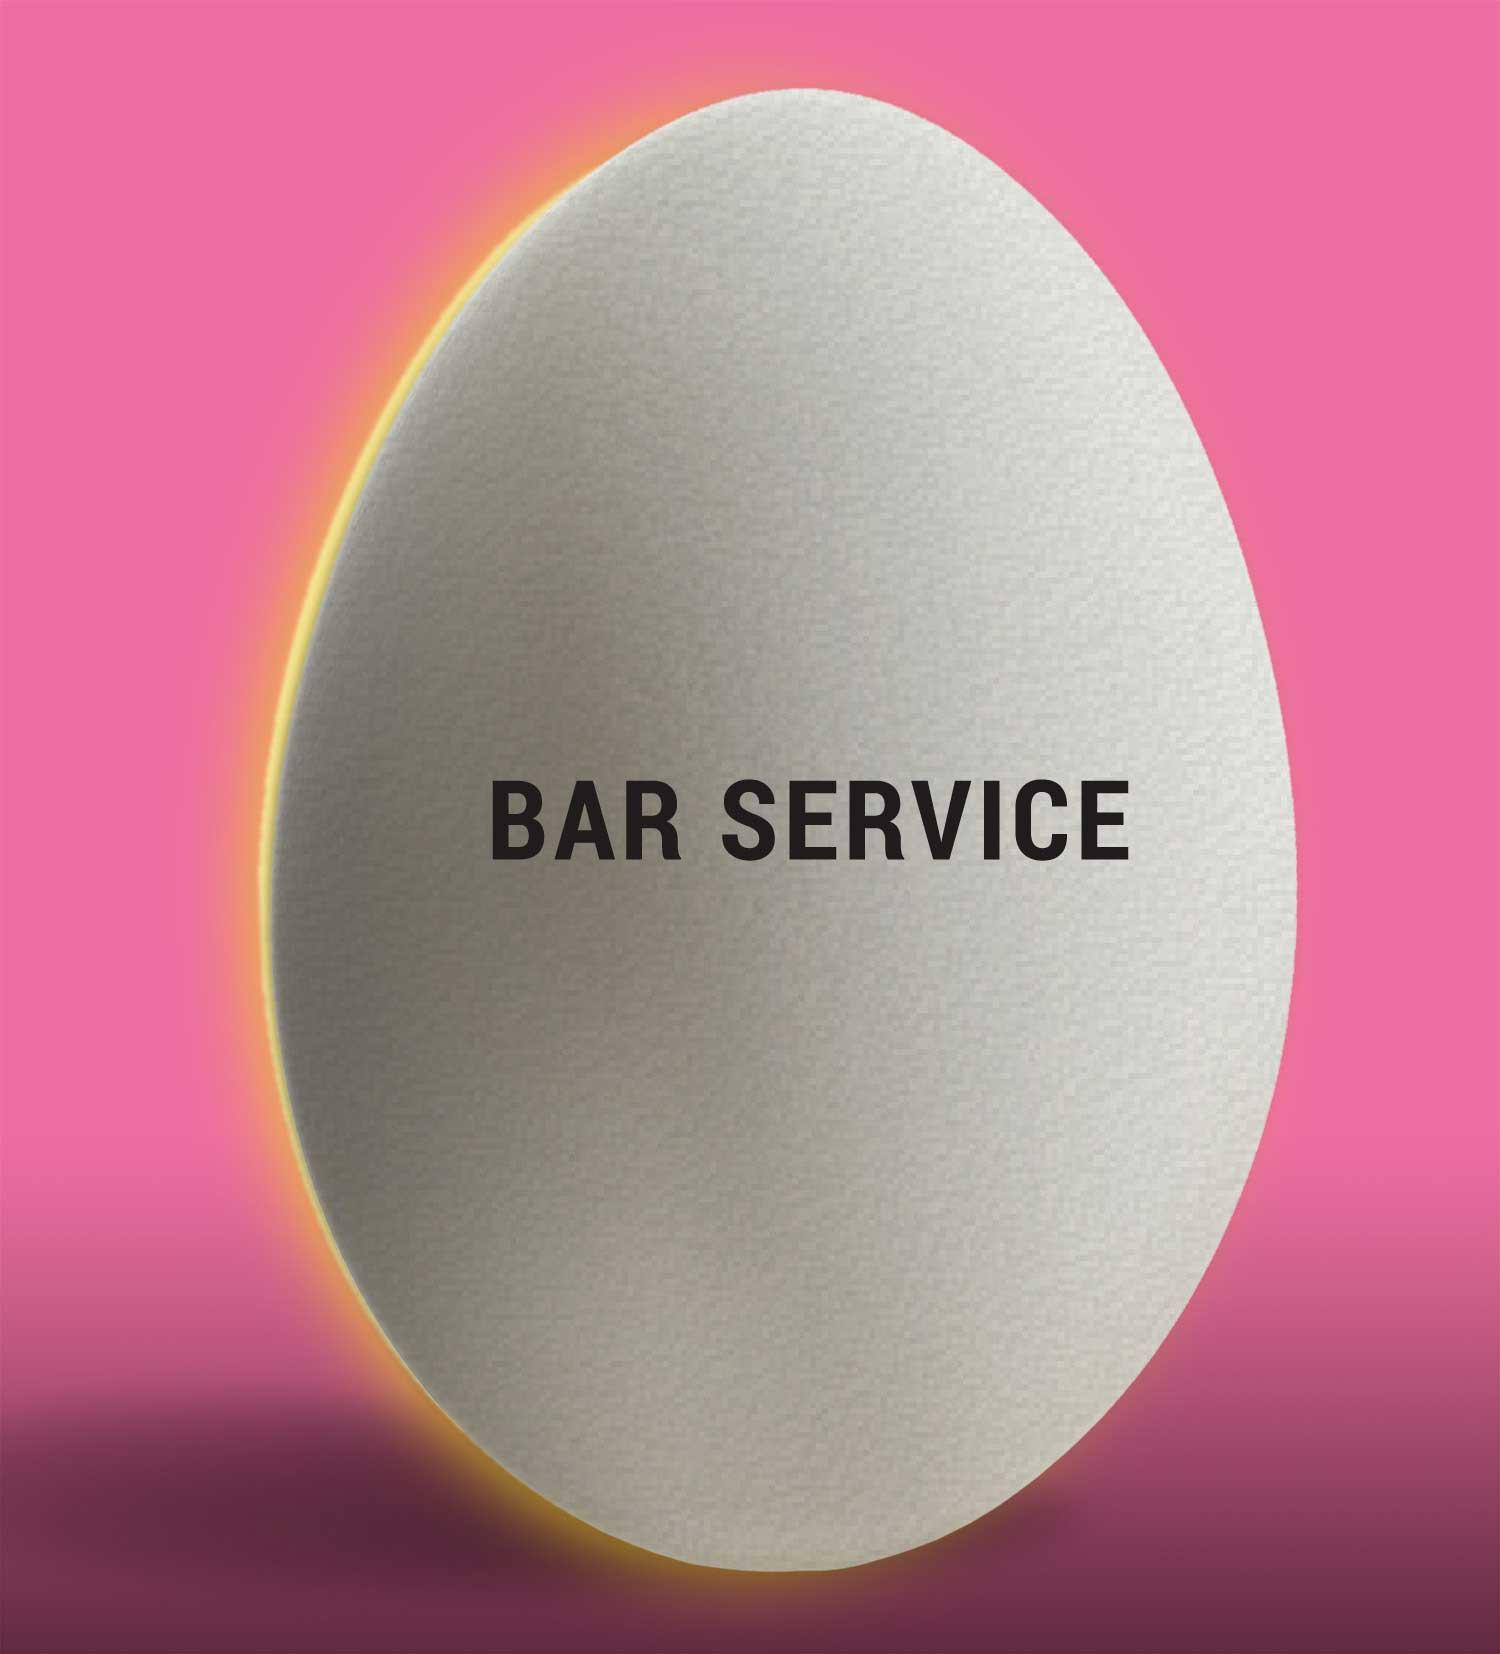 miami catering company | catering menu | bar service